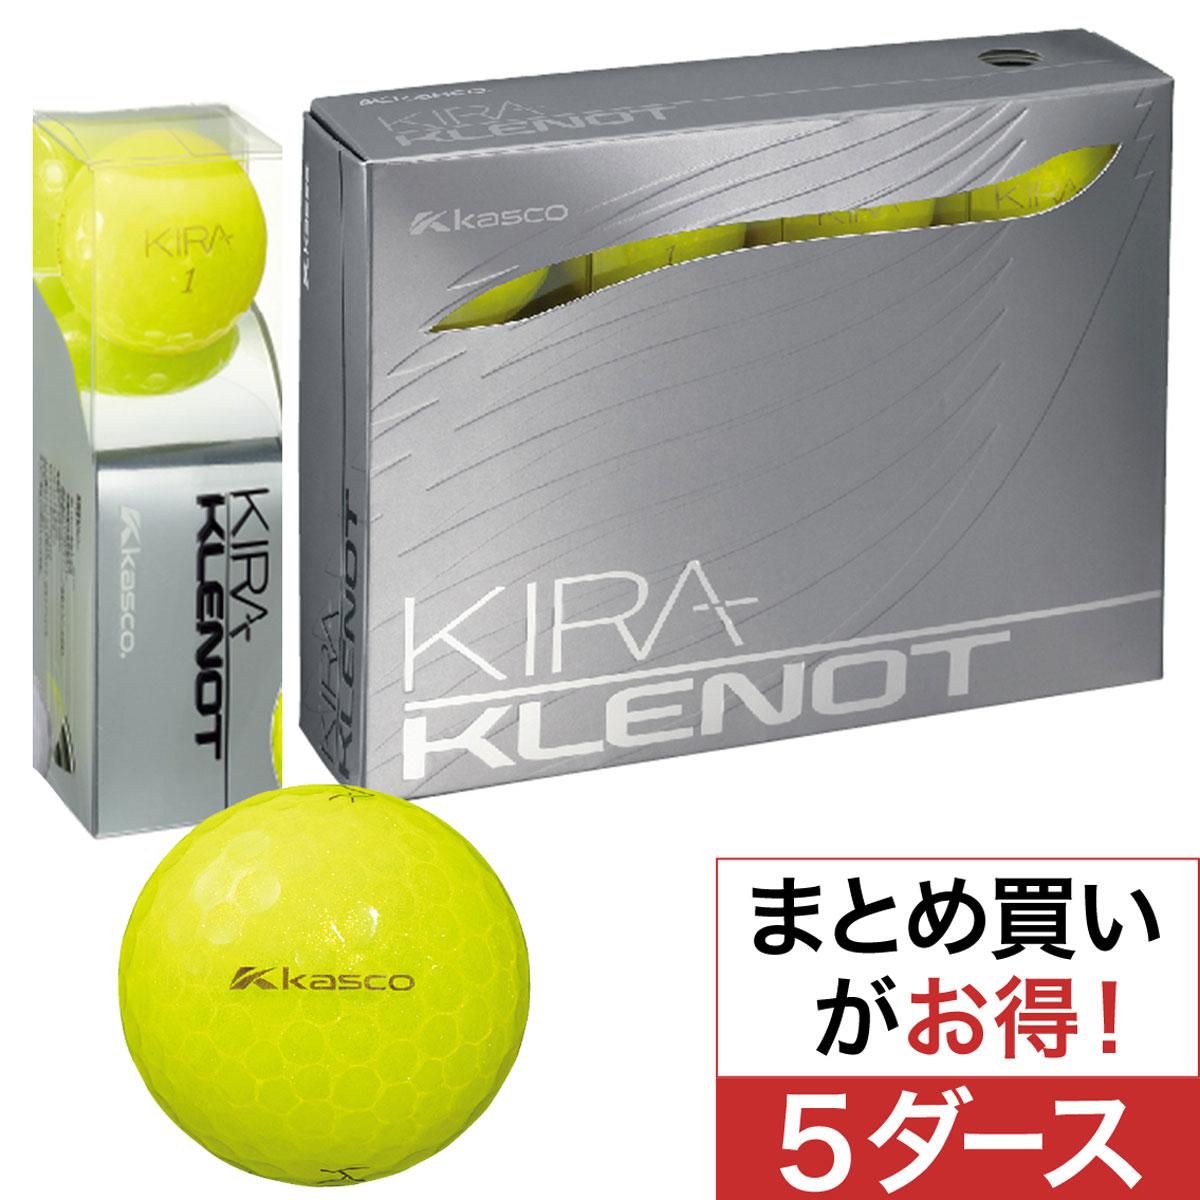 KIRA クレノ ボール 5ダースセット